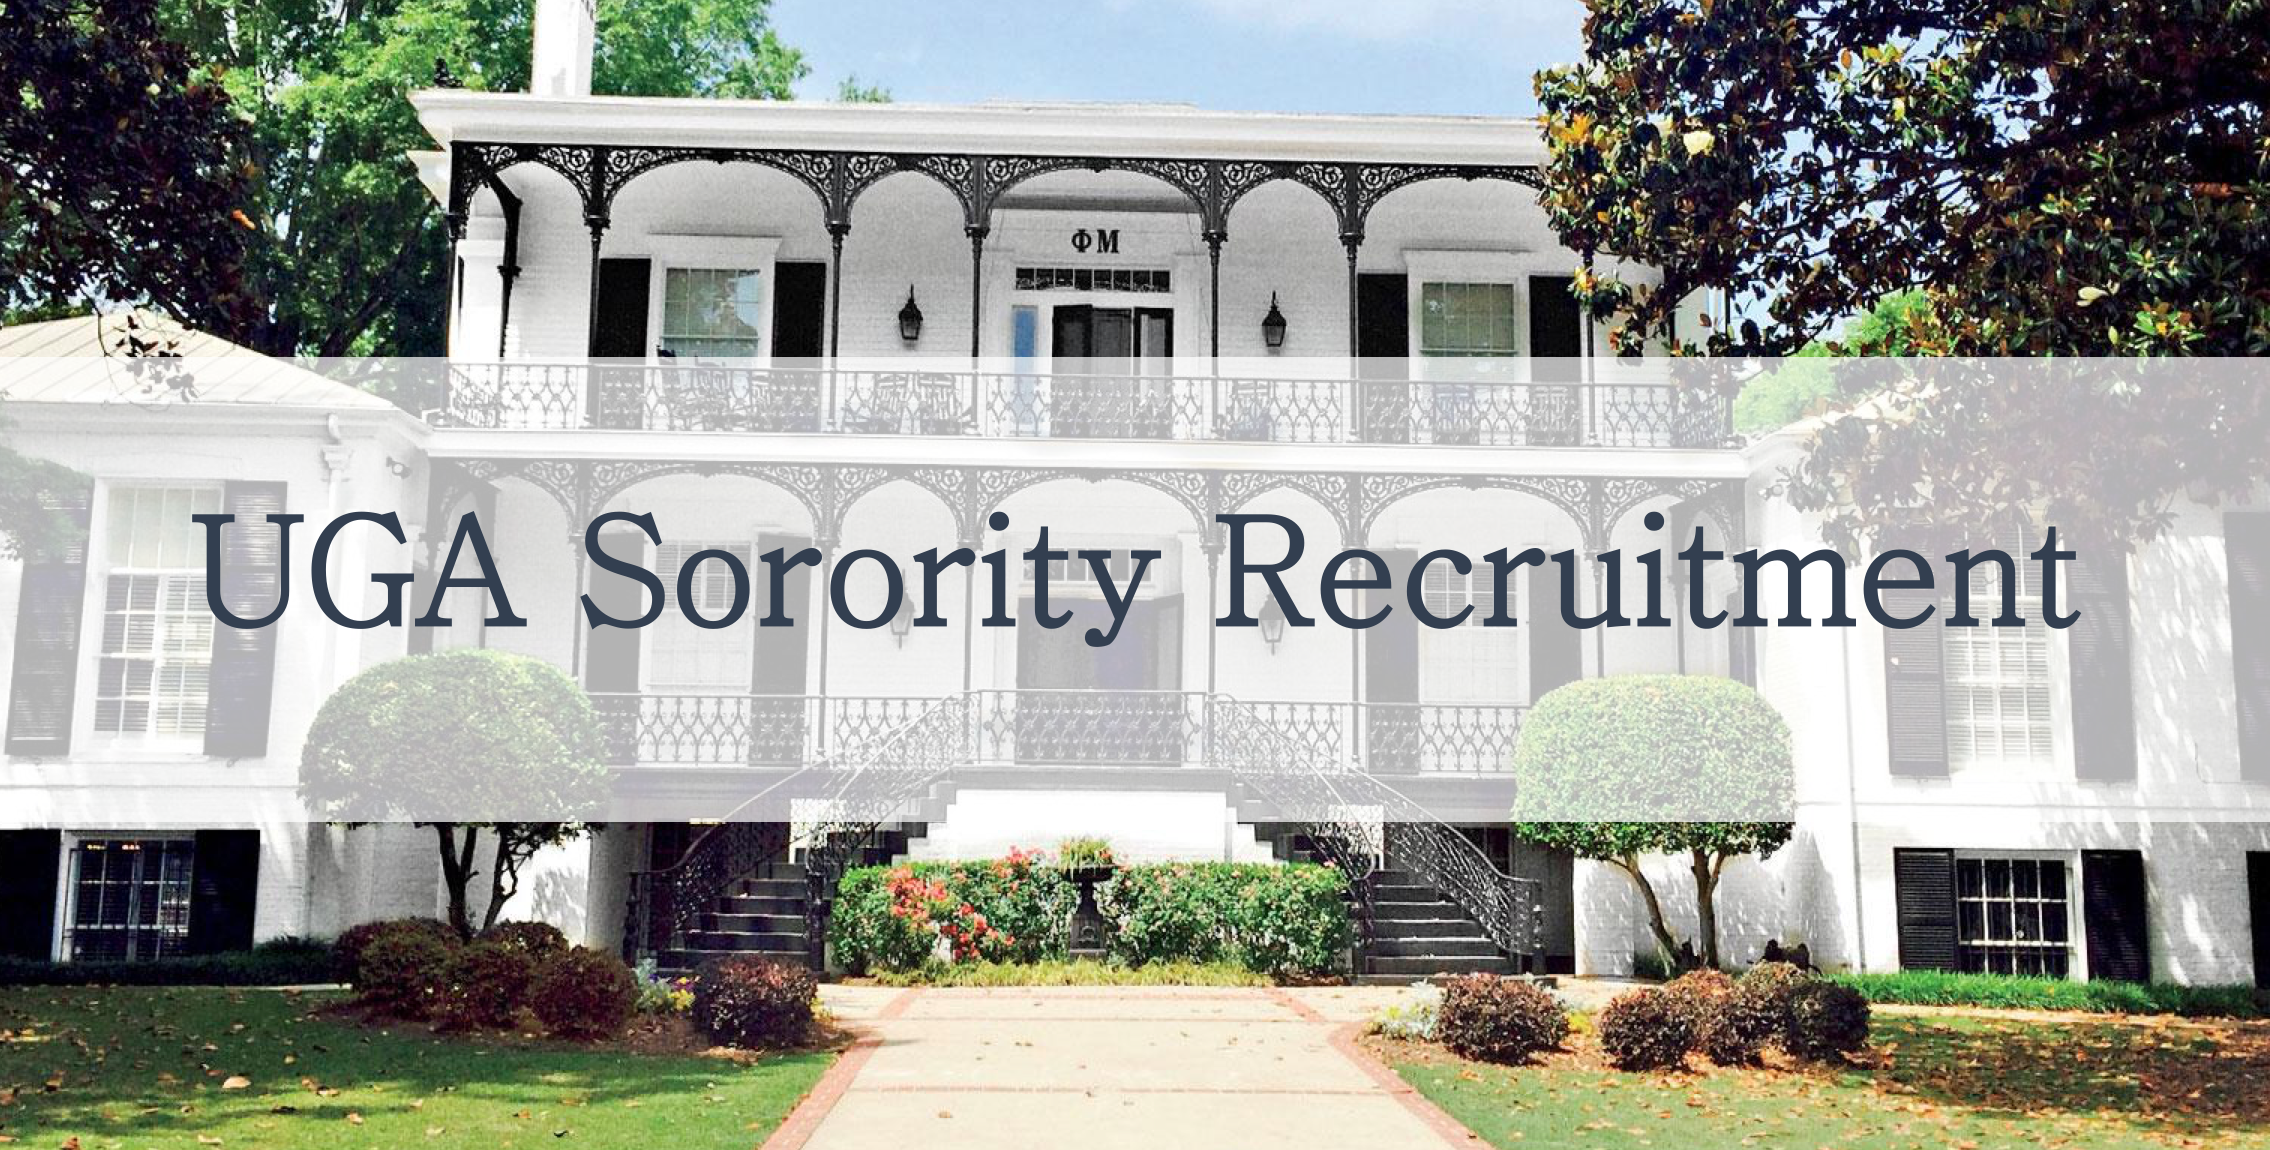 UGA Tri Delta House sorority chapter, sorority recruitment, University of Georgia, top houses